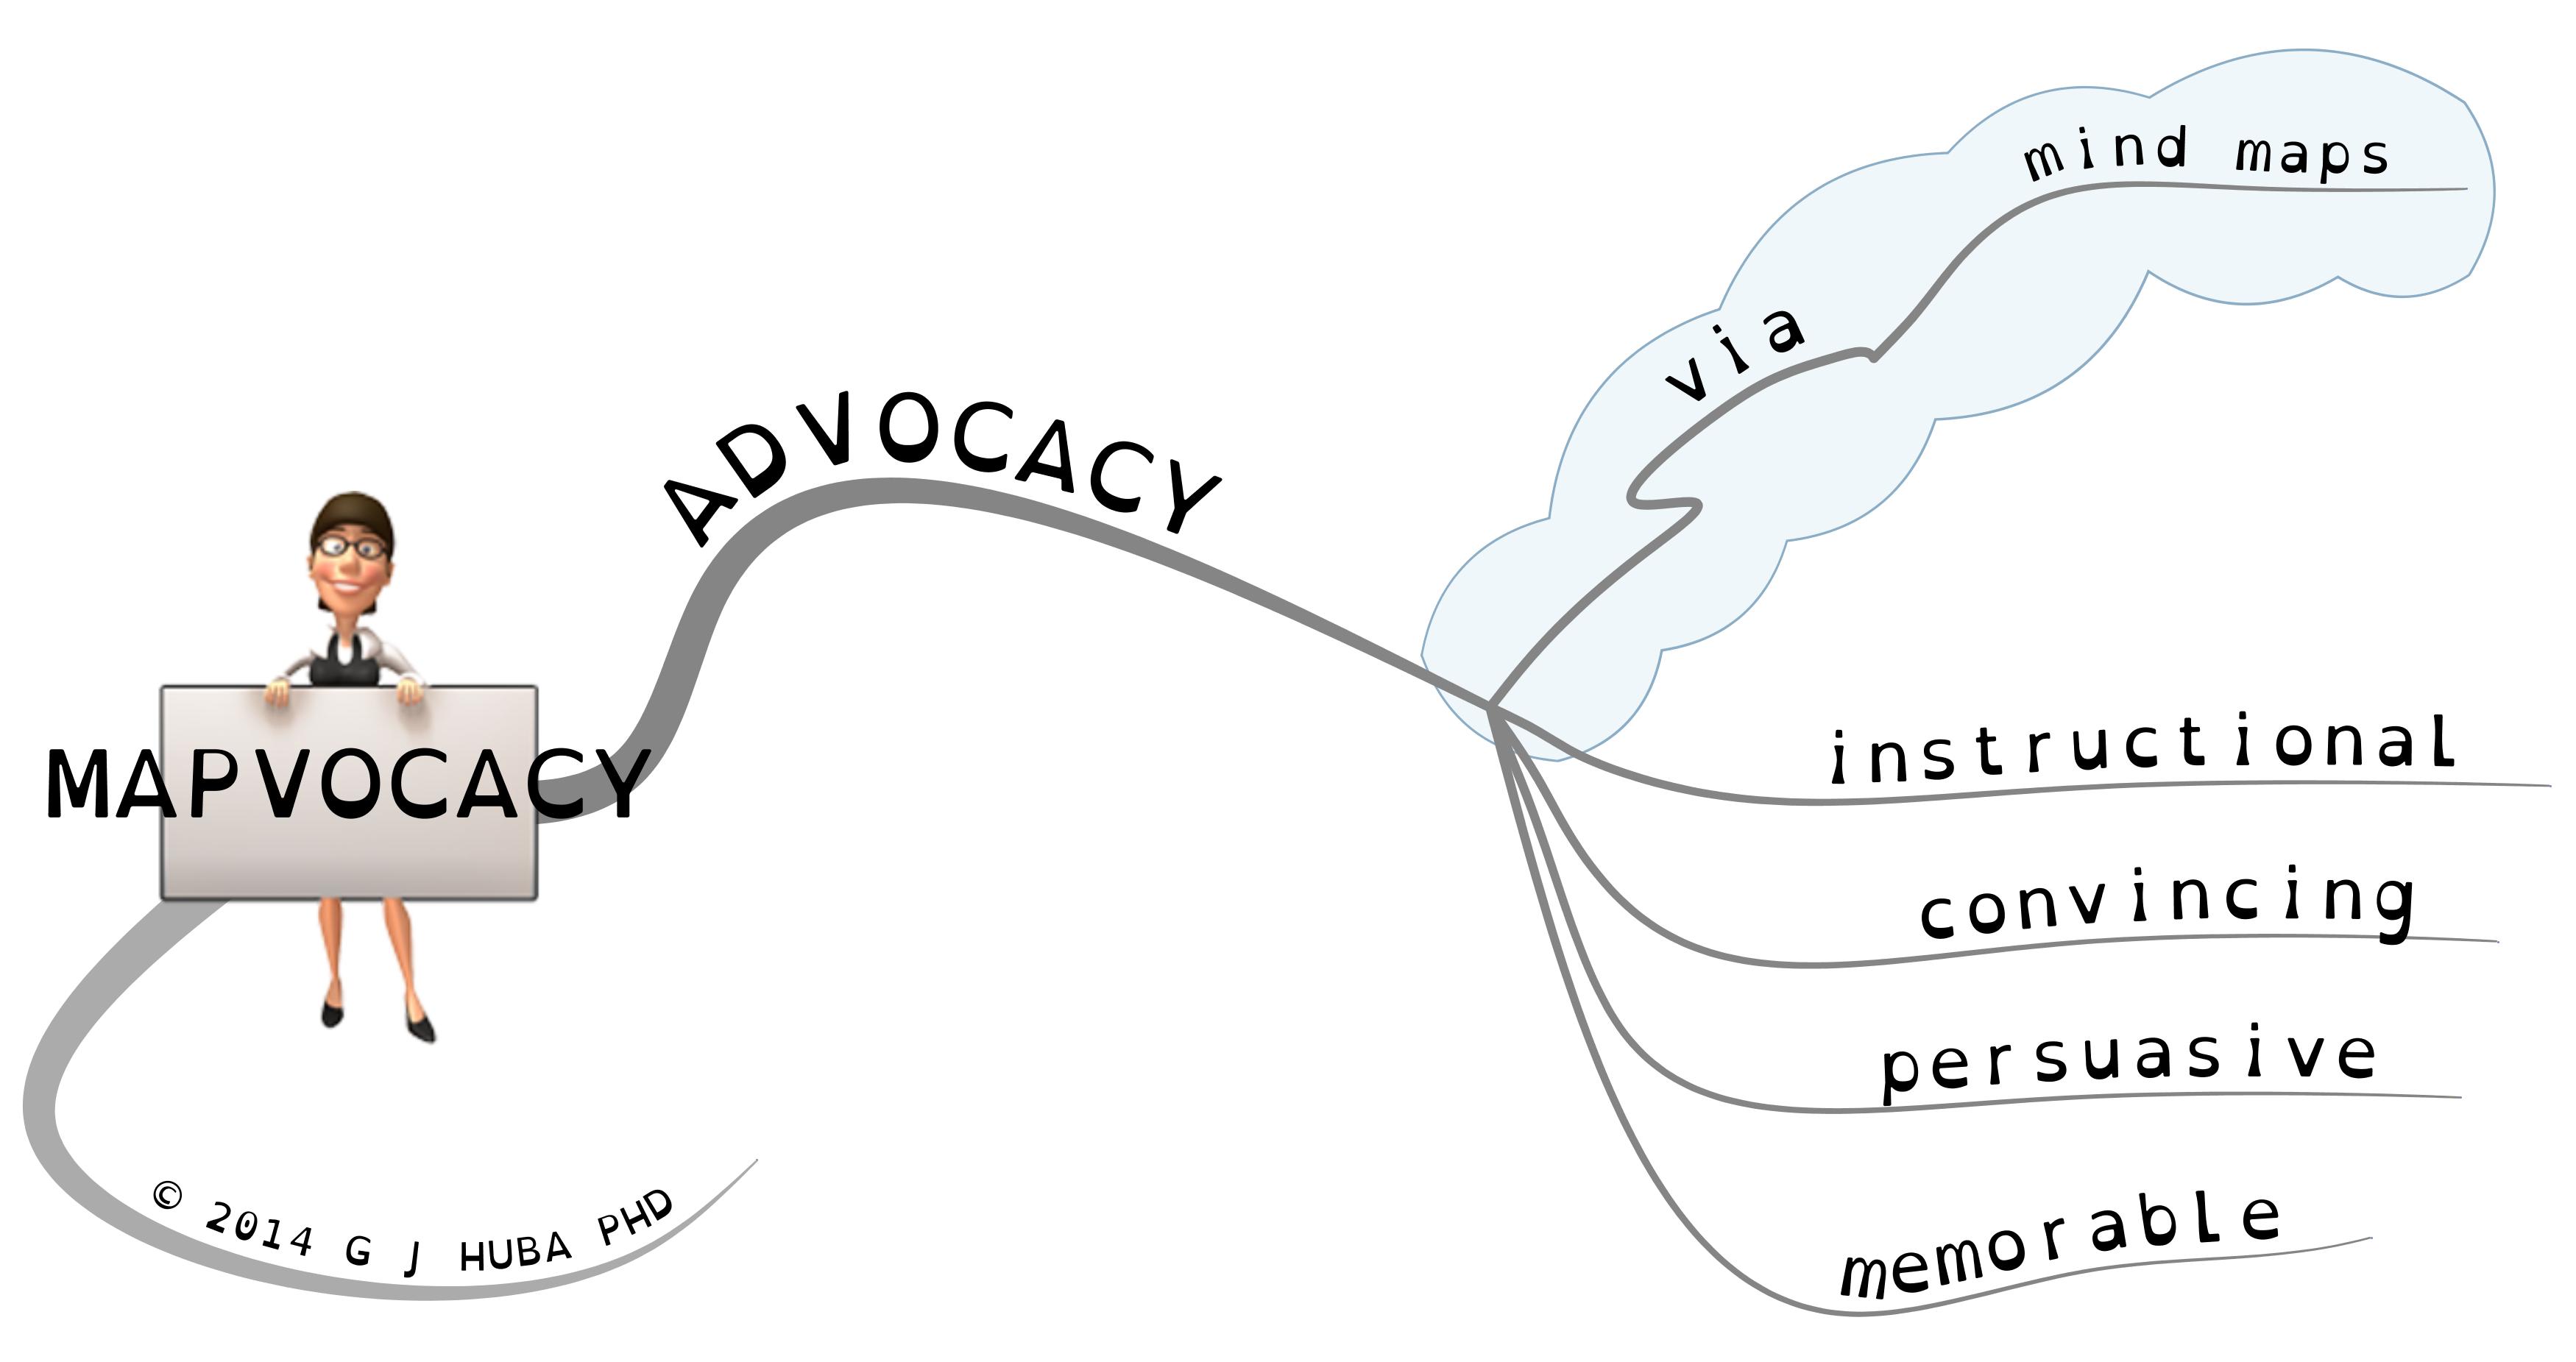 mapvocacy opendyslexicmono